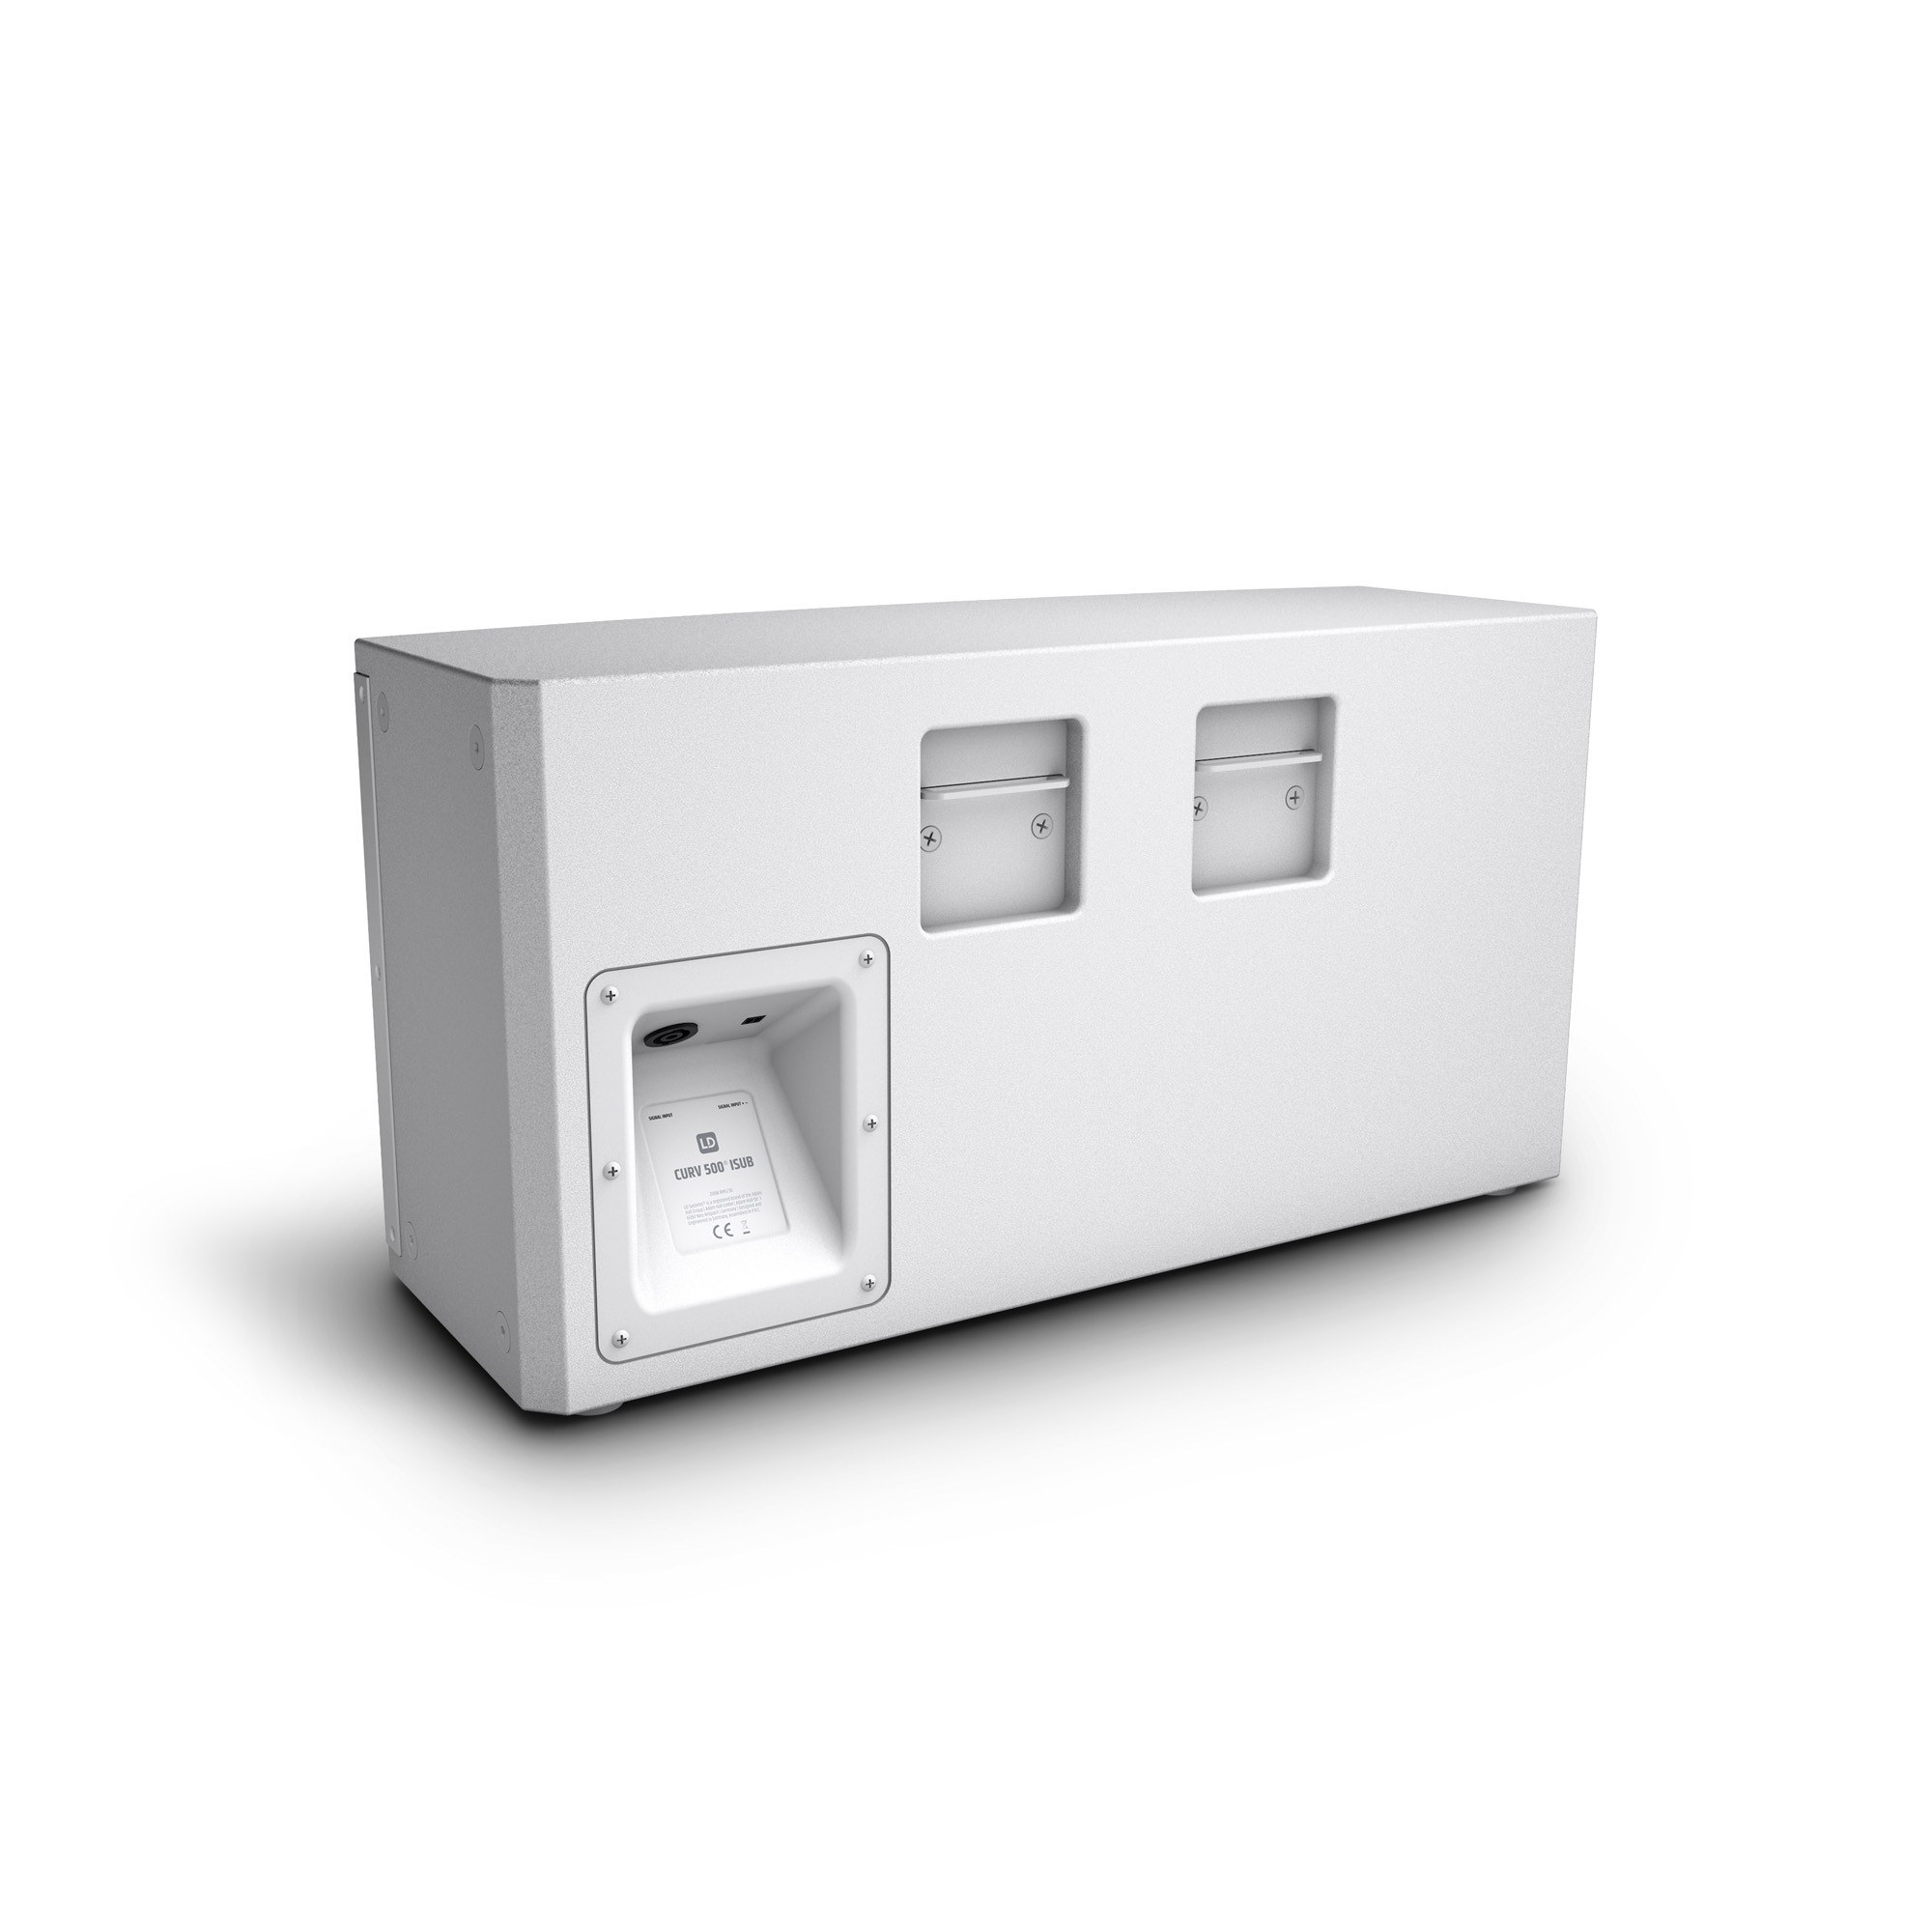 "CURV 500 ISUB W 10"" Installation Subwoofer 200 W white"